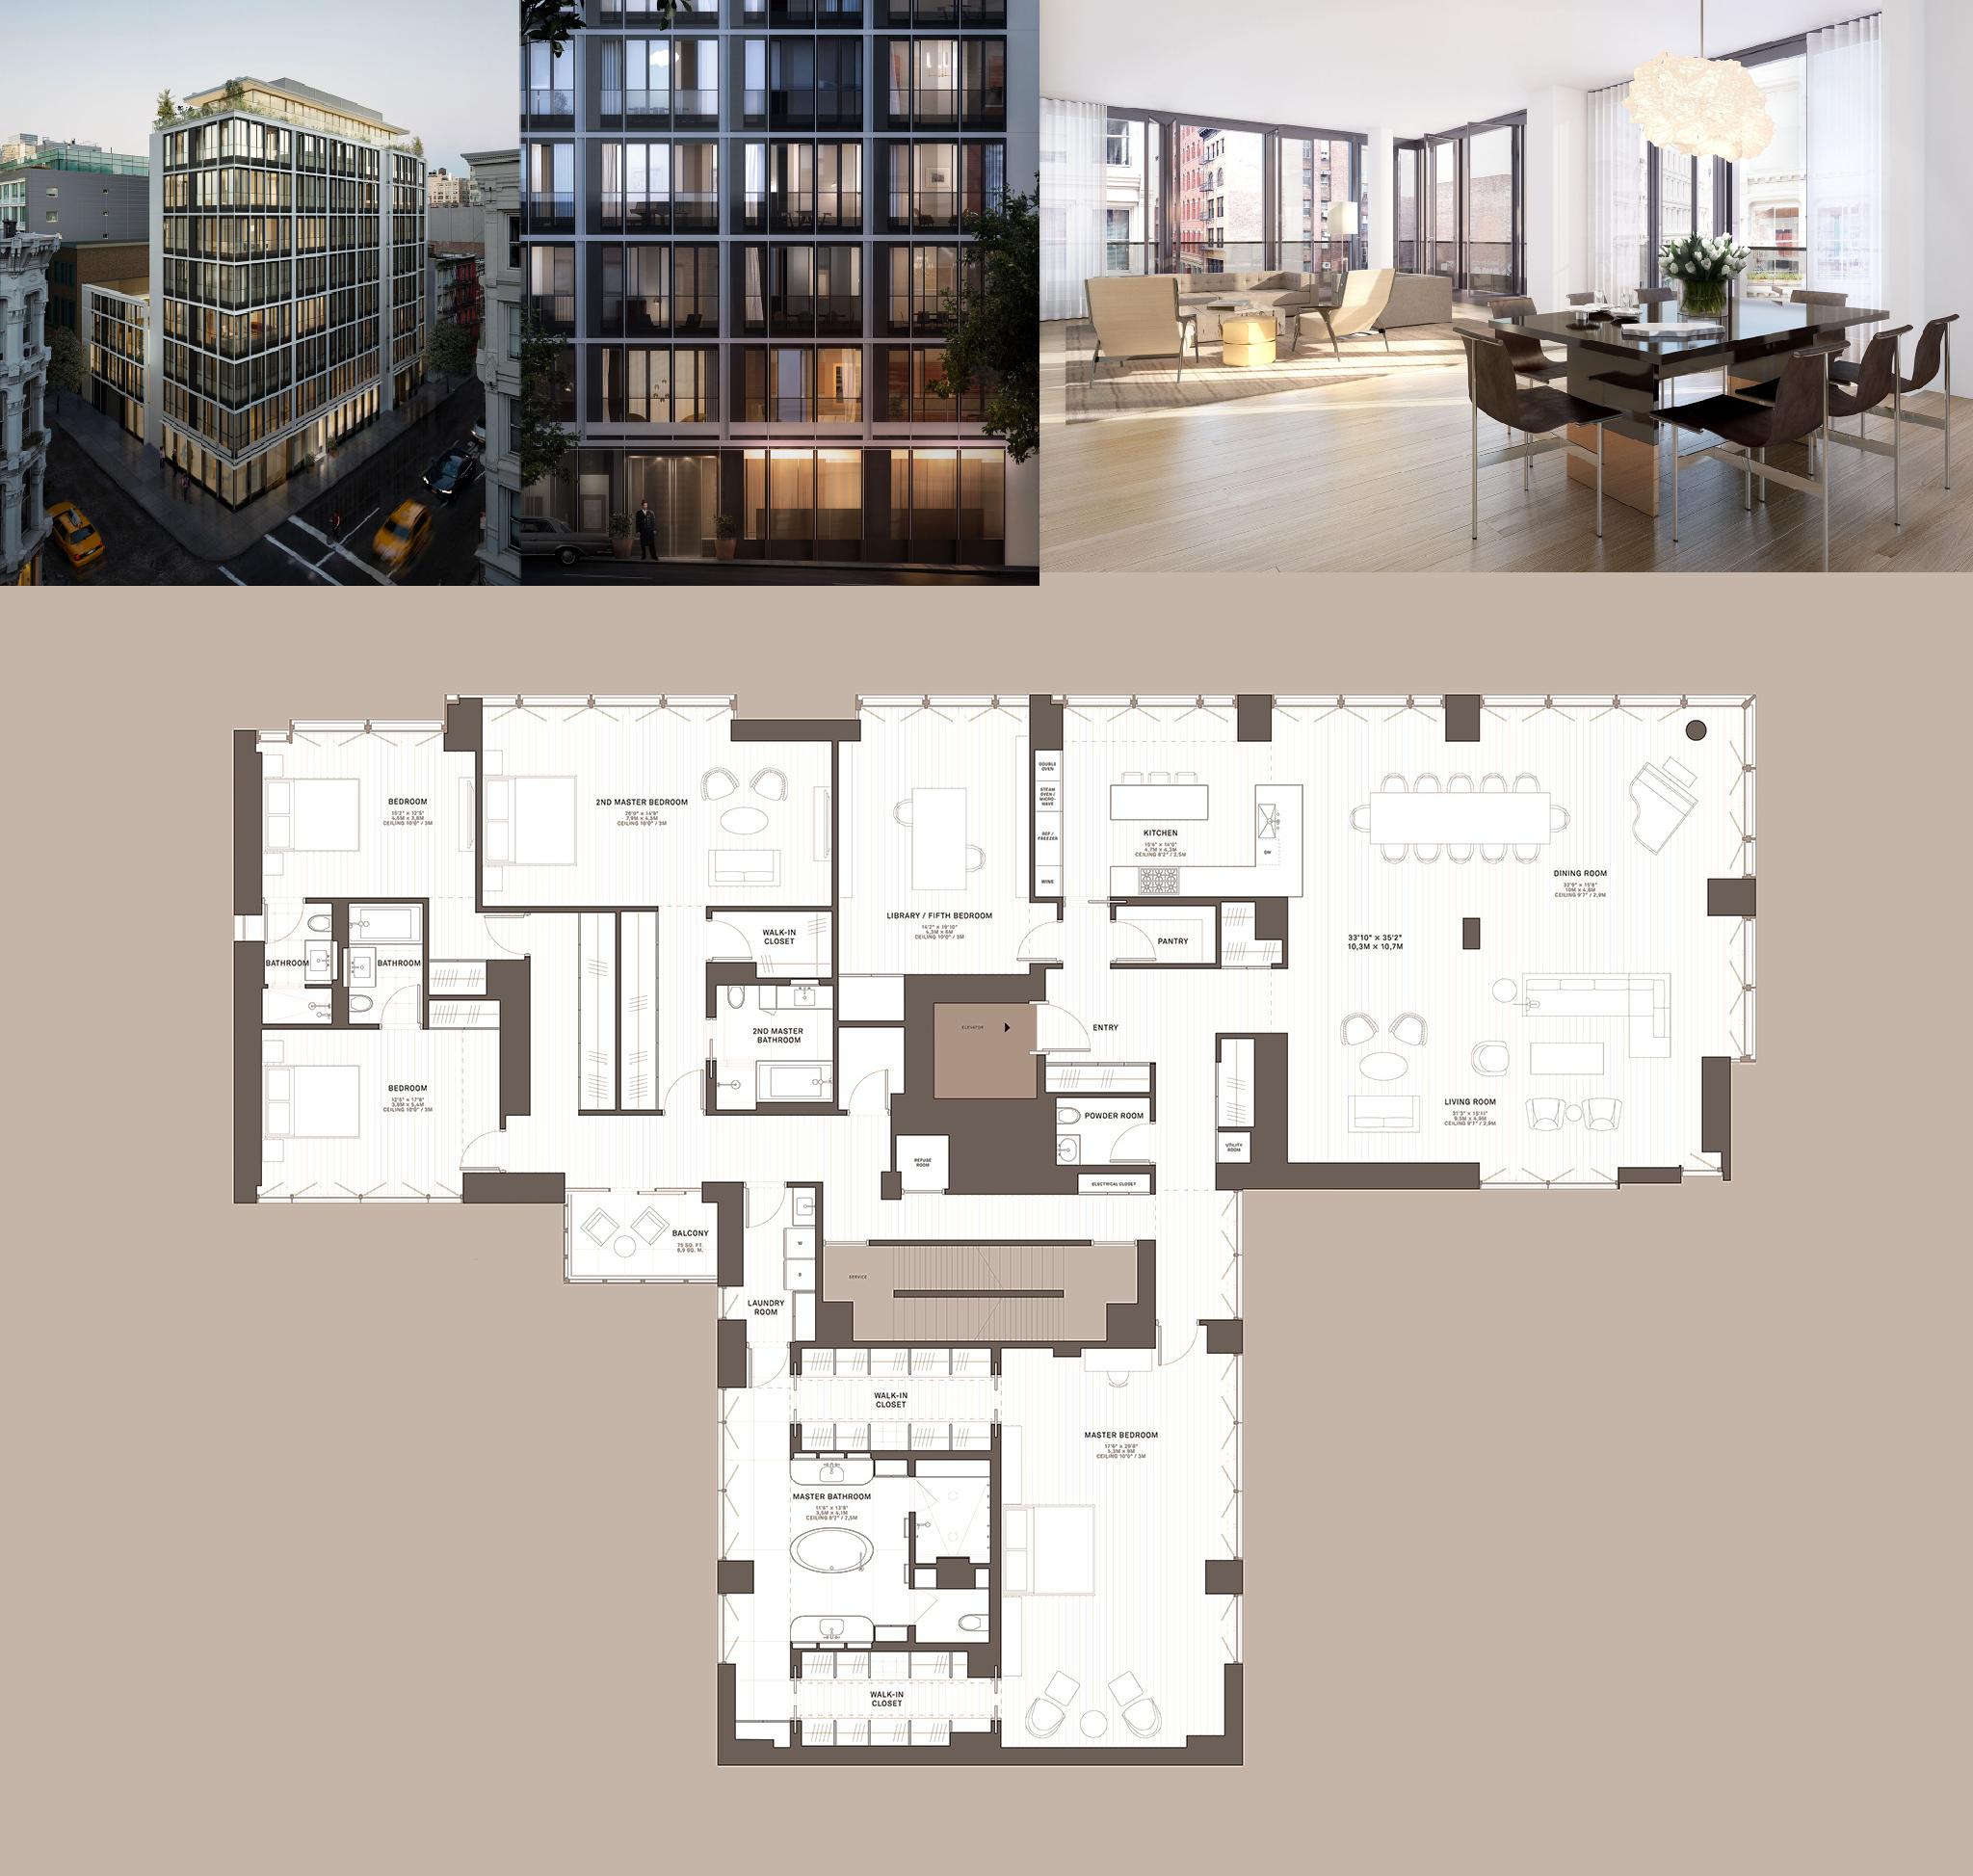 Two Bedroom Suites In New York City: 5,075 Sqft + Balcony 75 Sqft